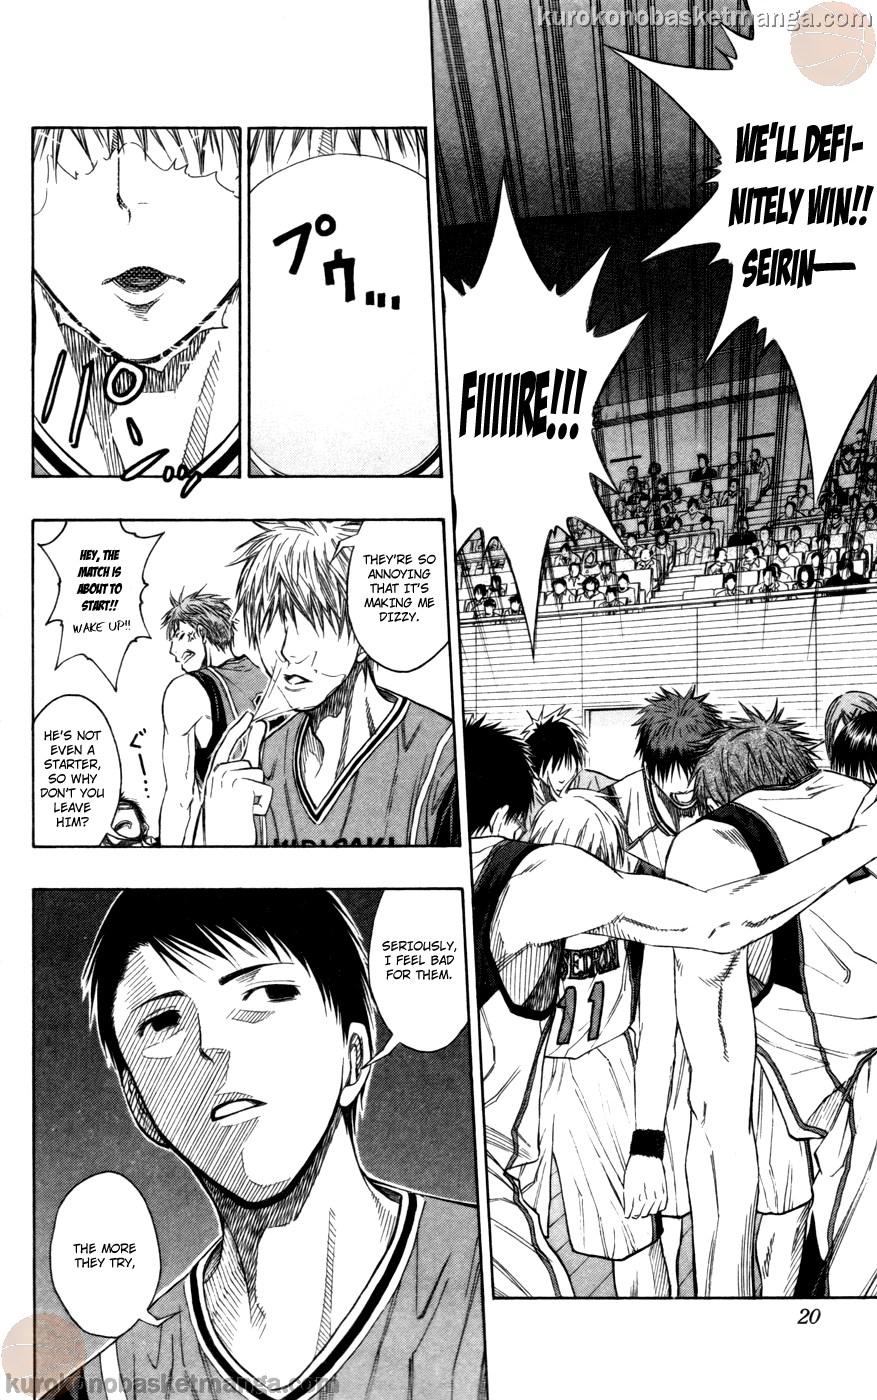 Kuroko no Basket Manga Chapter 100 - Image 18